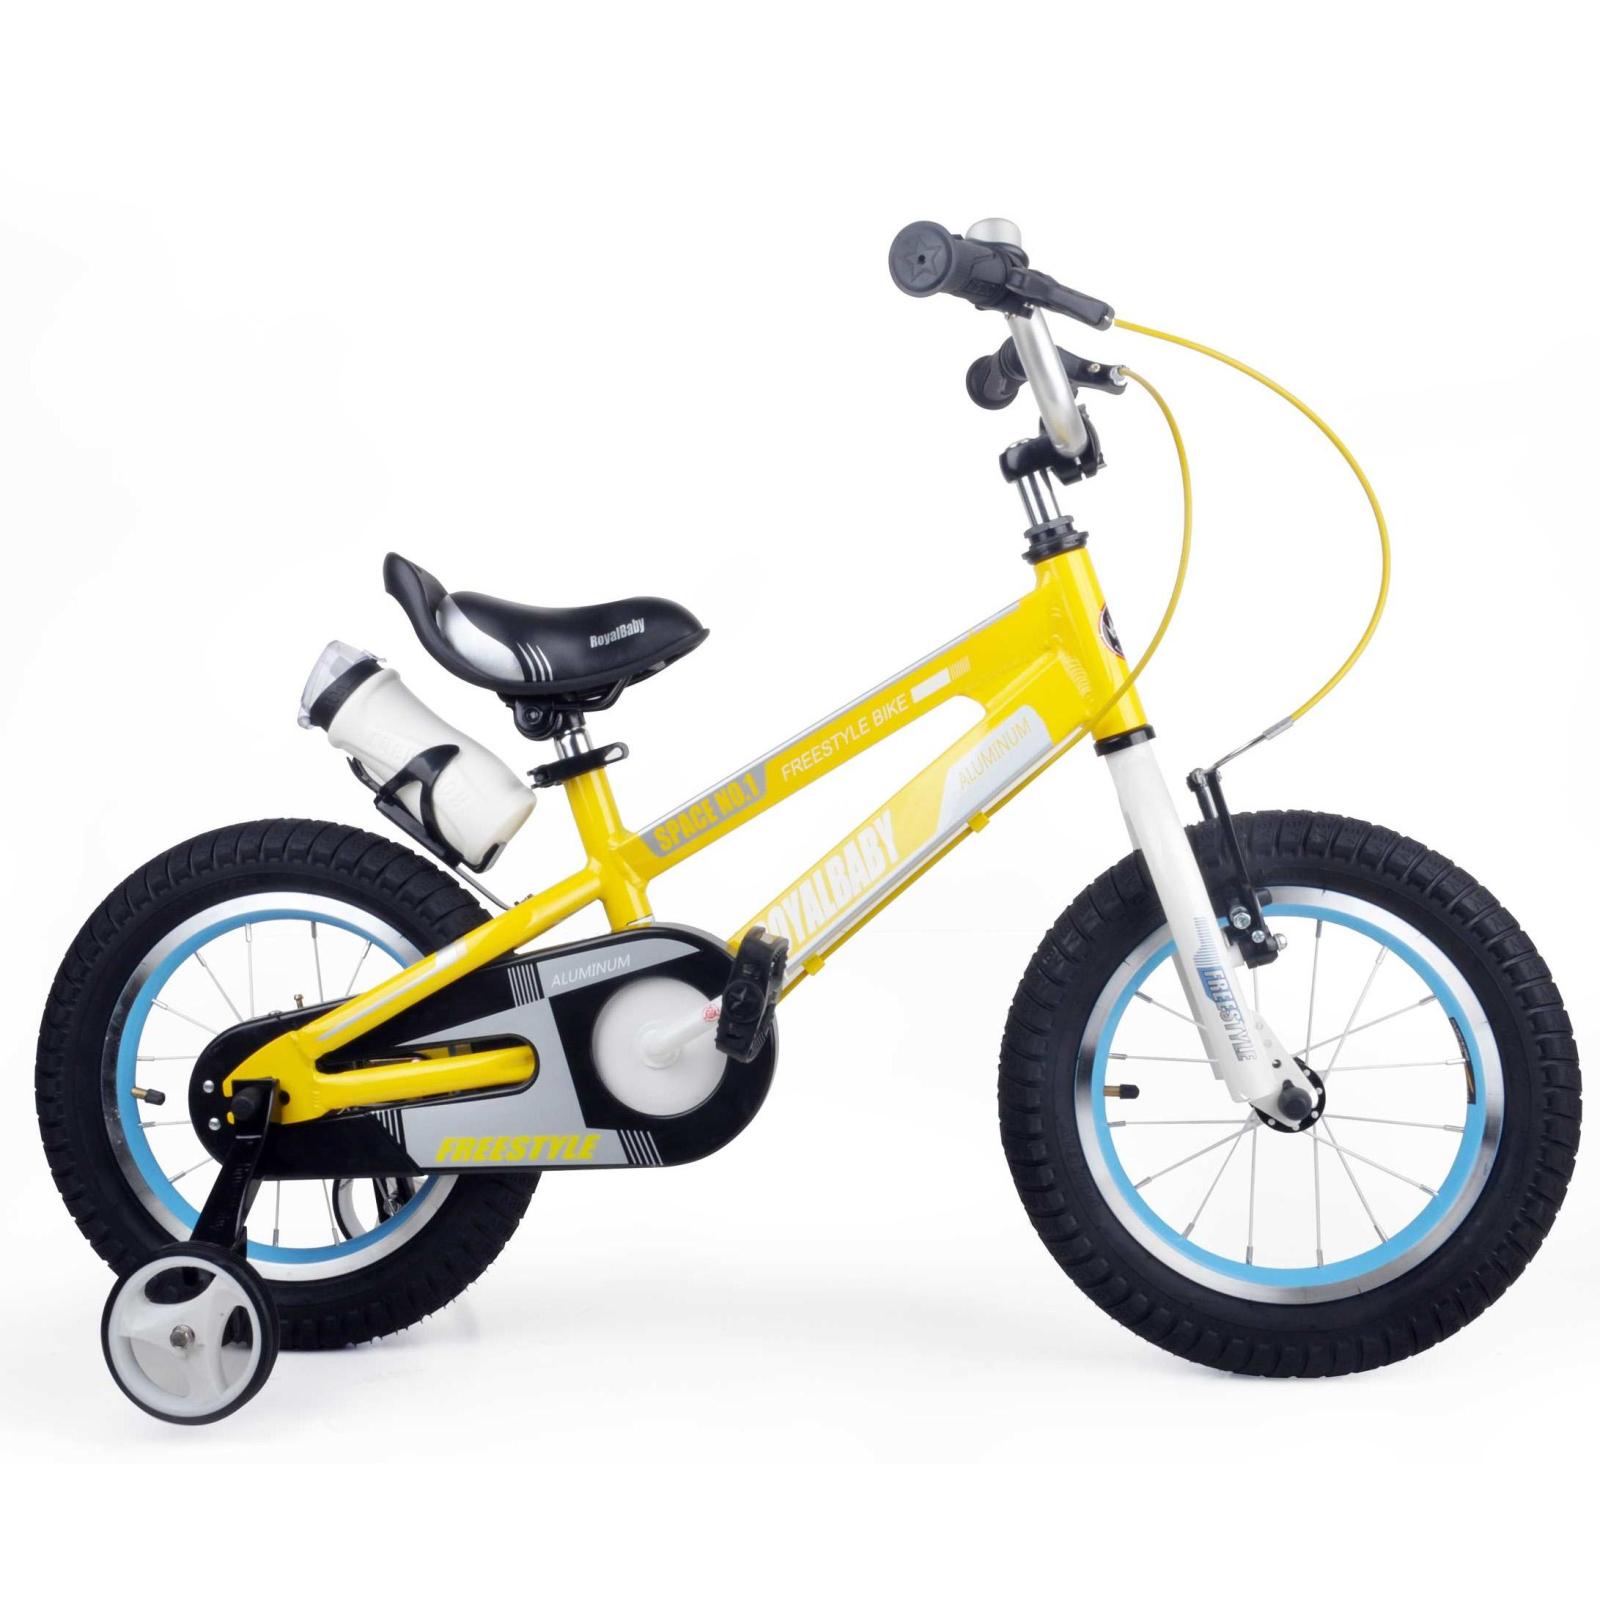 "Детский велосипед Royal Baby SPACE NO.1 Alu 16"", желтый (RB16-17-YEL)"